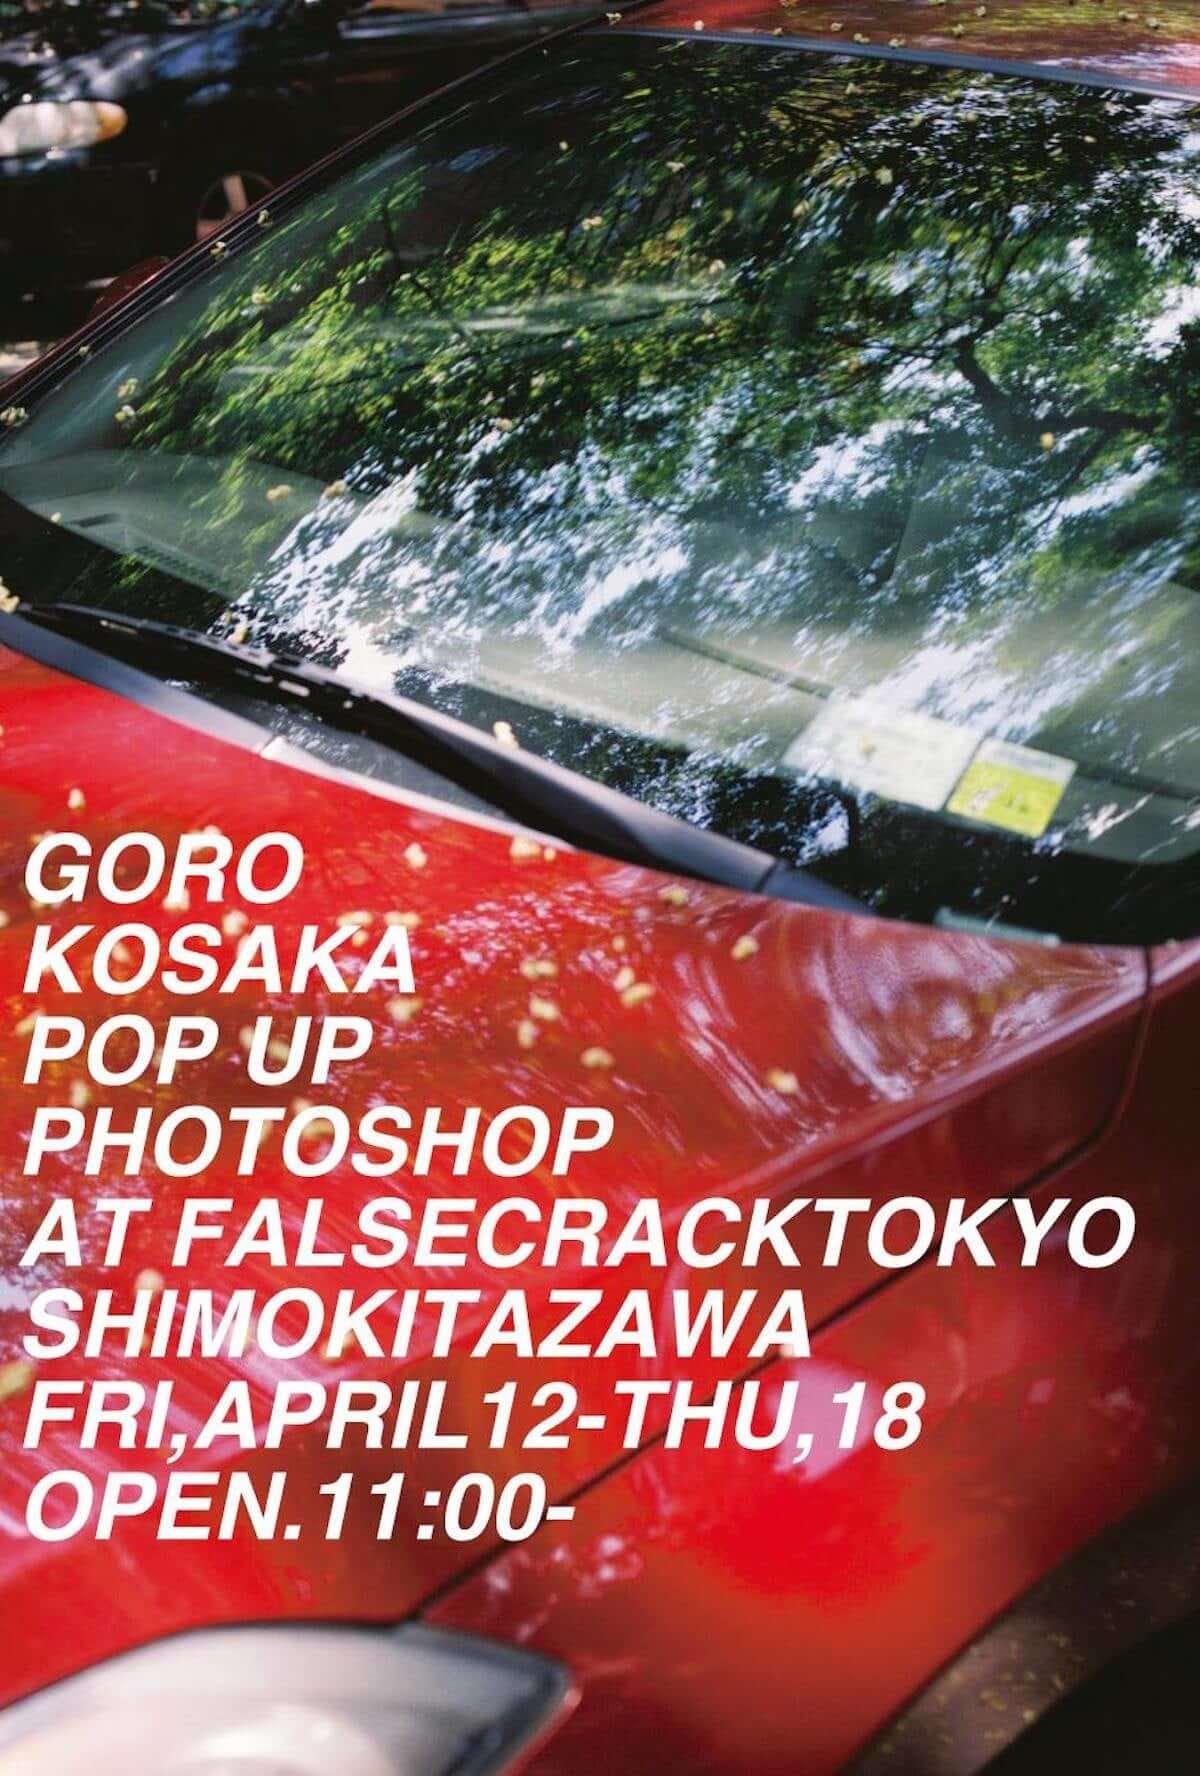 Goro Kosakaによる写真展「pop up photoshop」が本日から4月18日まで、下北沢FALSECRACKTOKYOにて開催 art-culture190412-gorokosaka-1200x1776